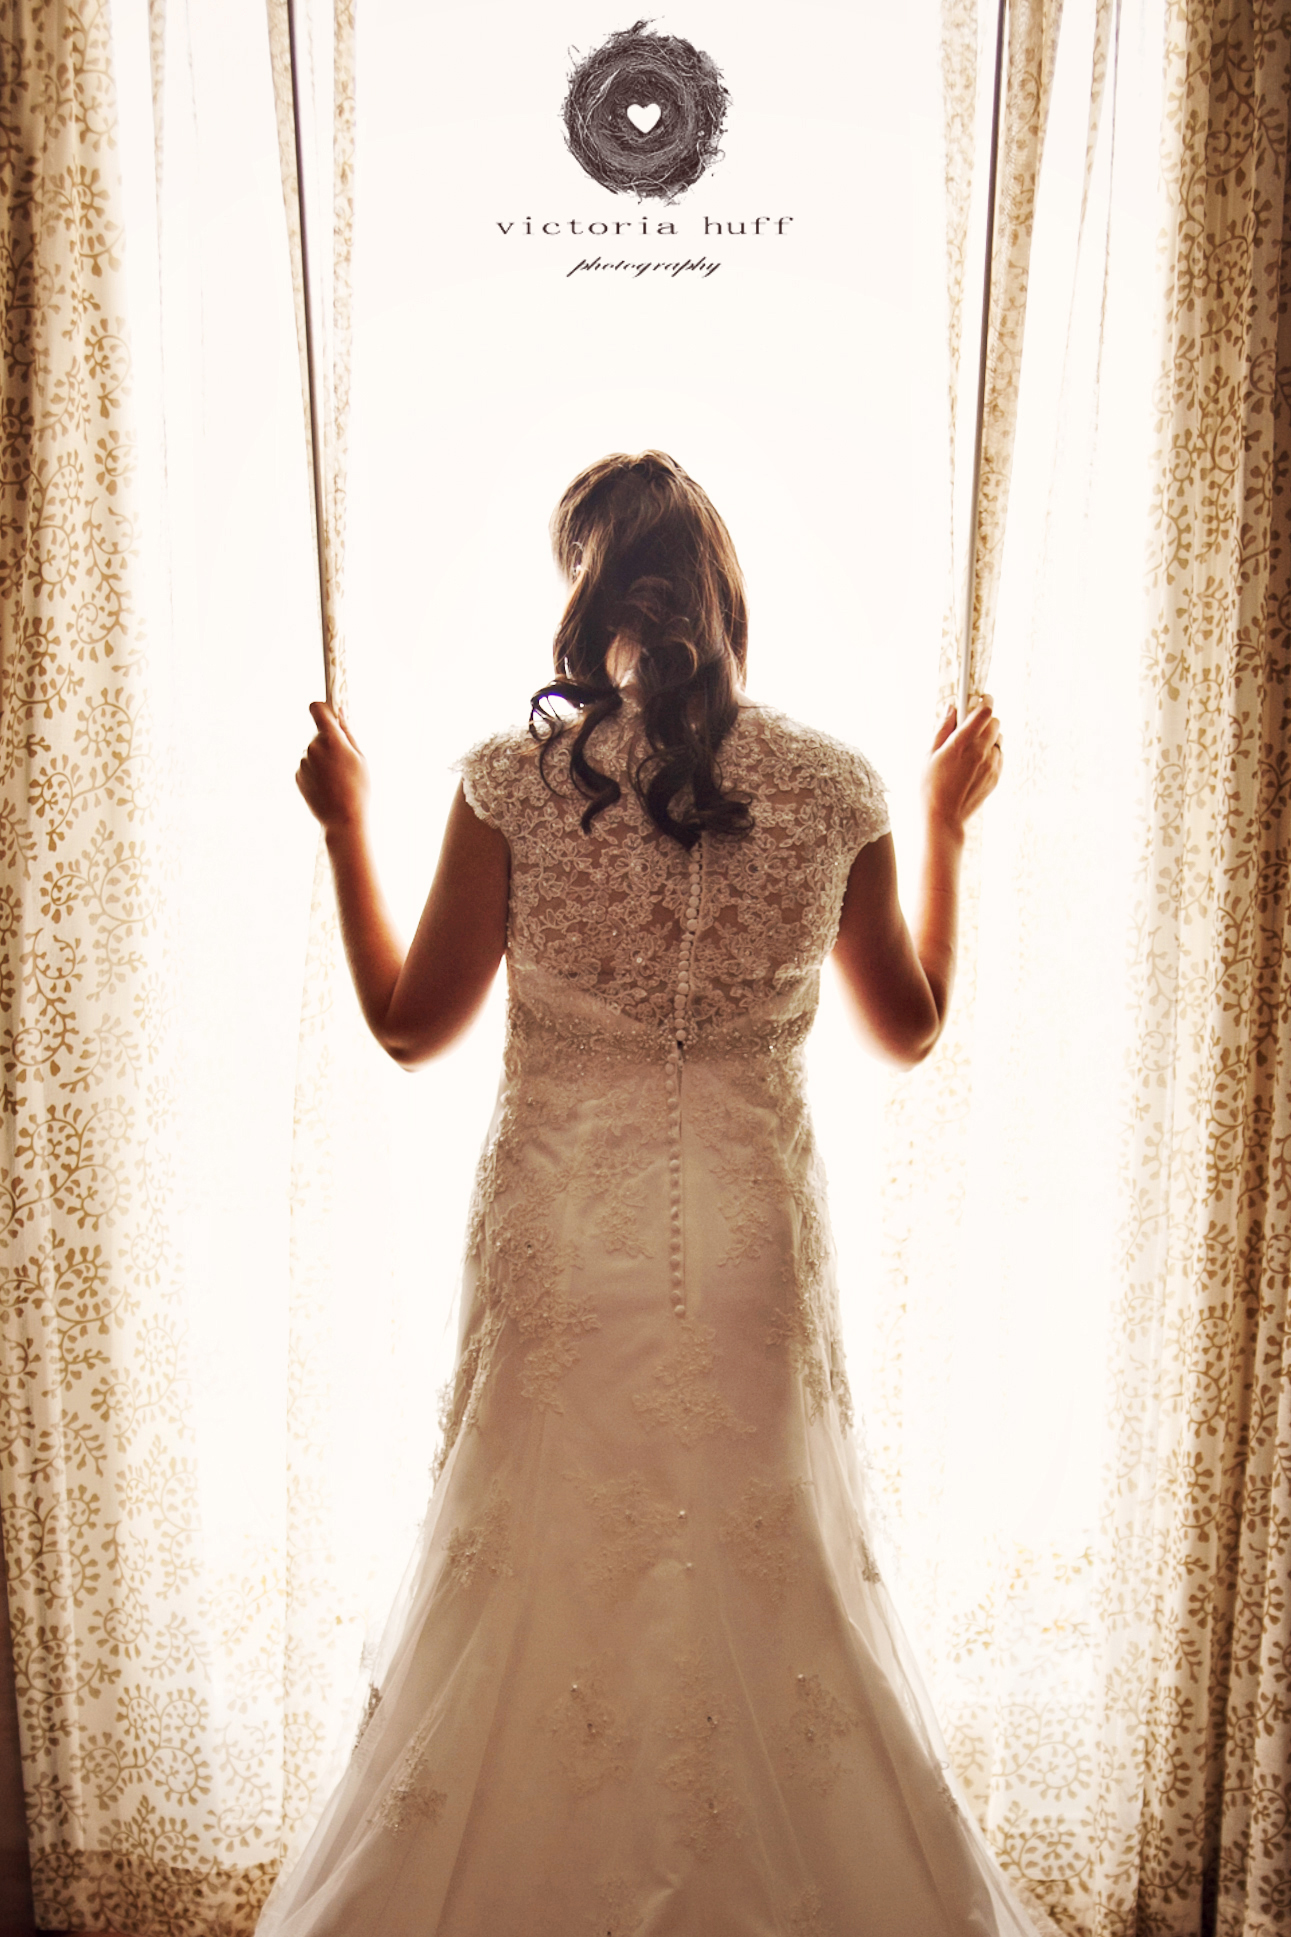 Wedding-Photography-Lindsay-Collins-Jason-Baggett-Wedding-Centennial-Park-Nashville-Tennessee-Hotel-Indigo-Vintage-191.jpg